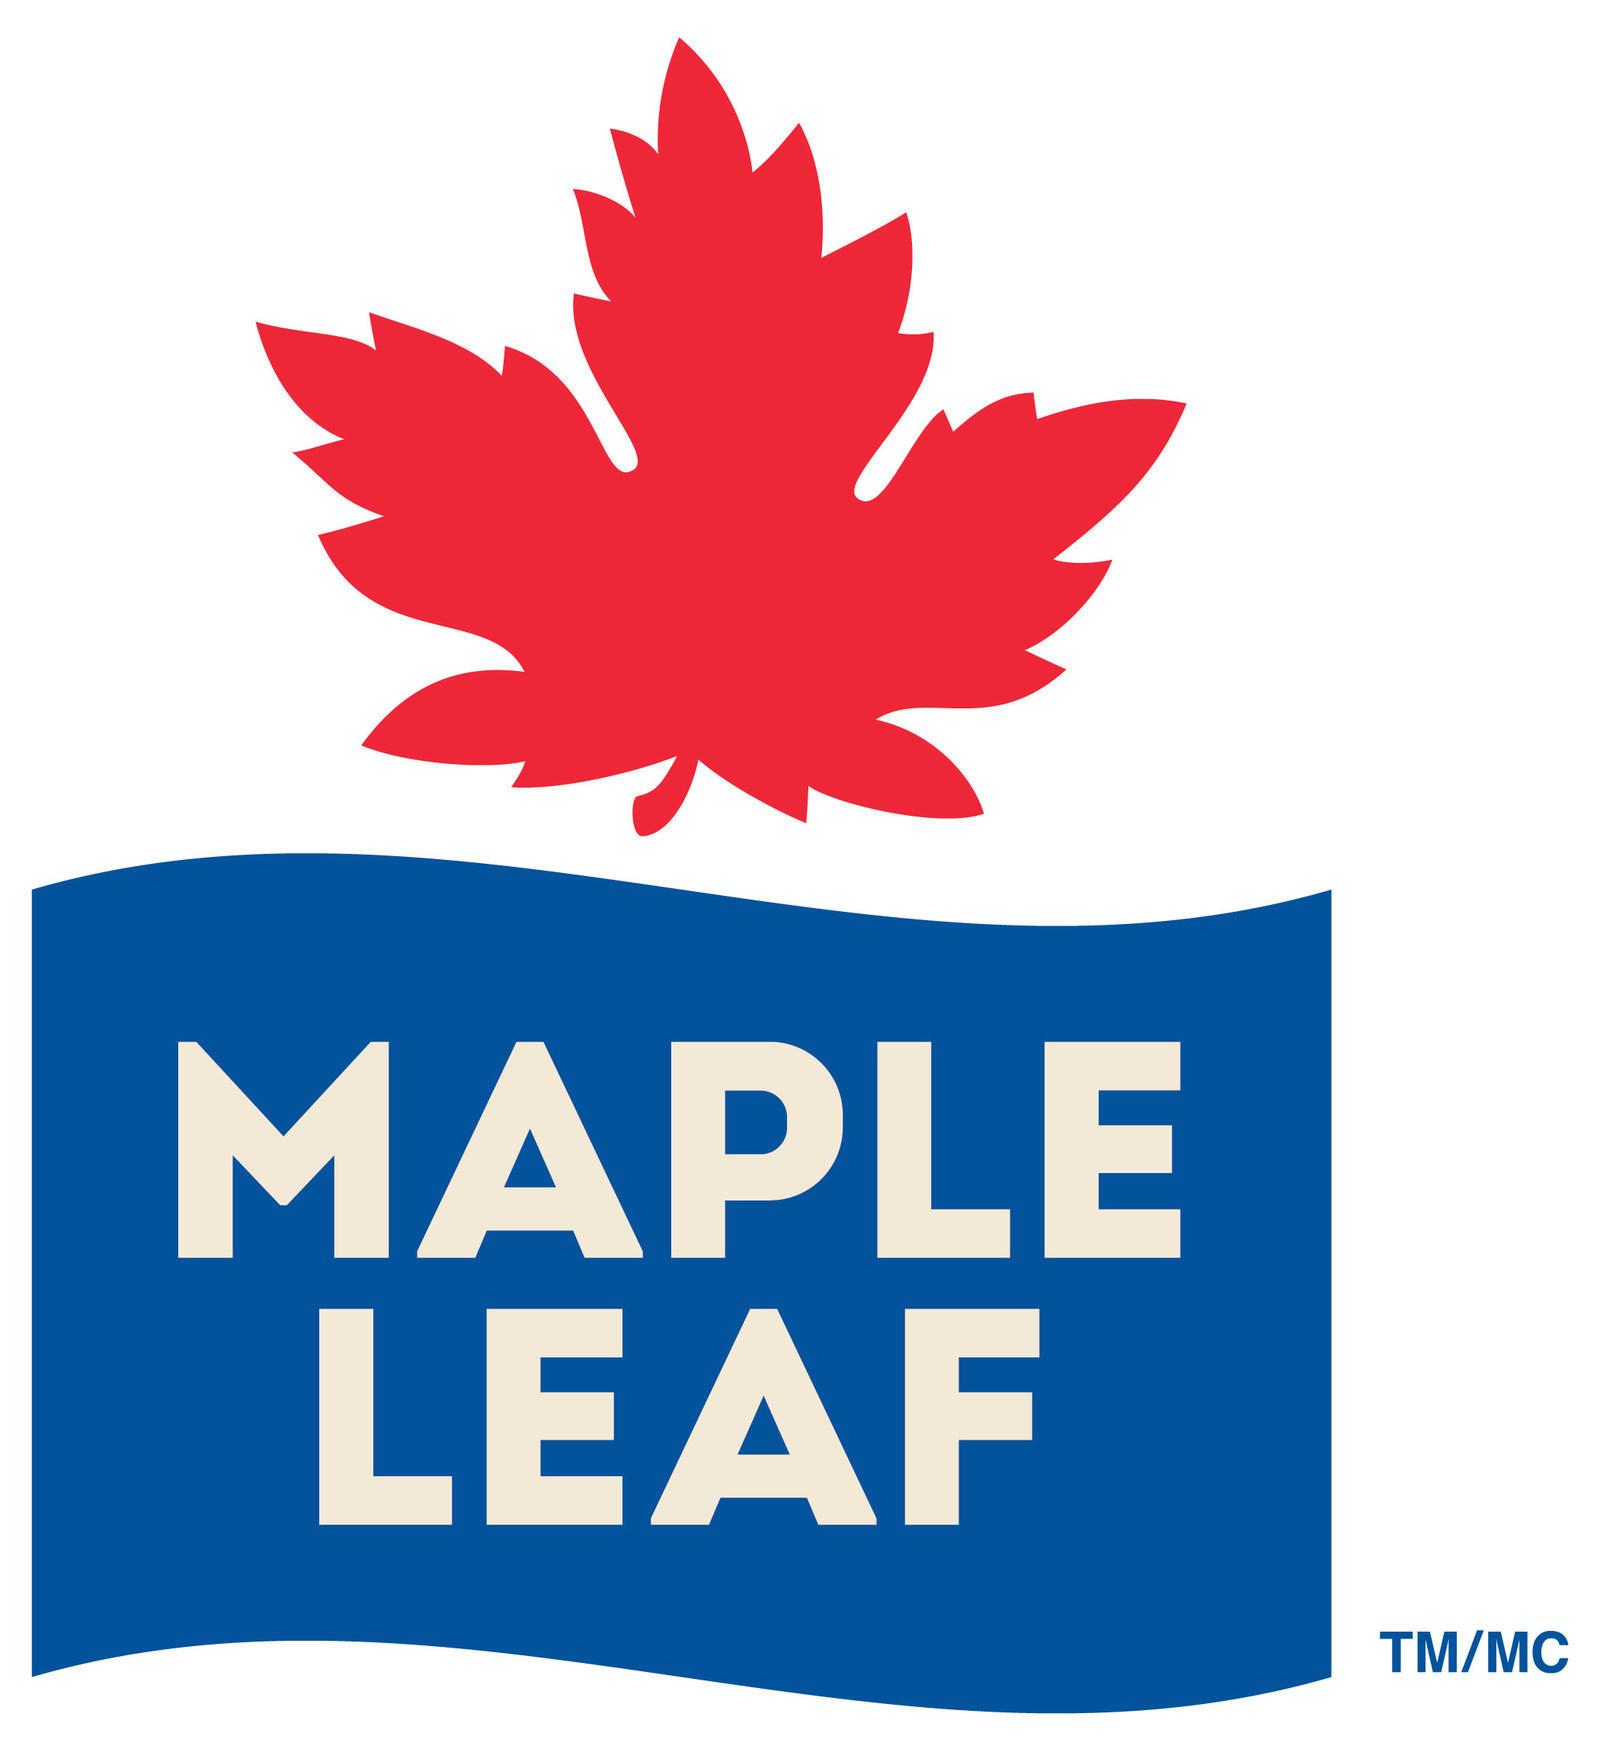 719cee73ef6ba0 Maple Leaf Foods Inc  Maple Leaf Joins Global CEOs to Urge Great.jpg p publish